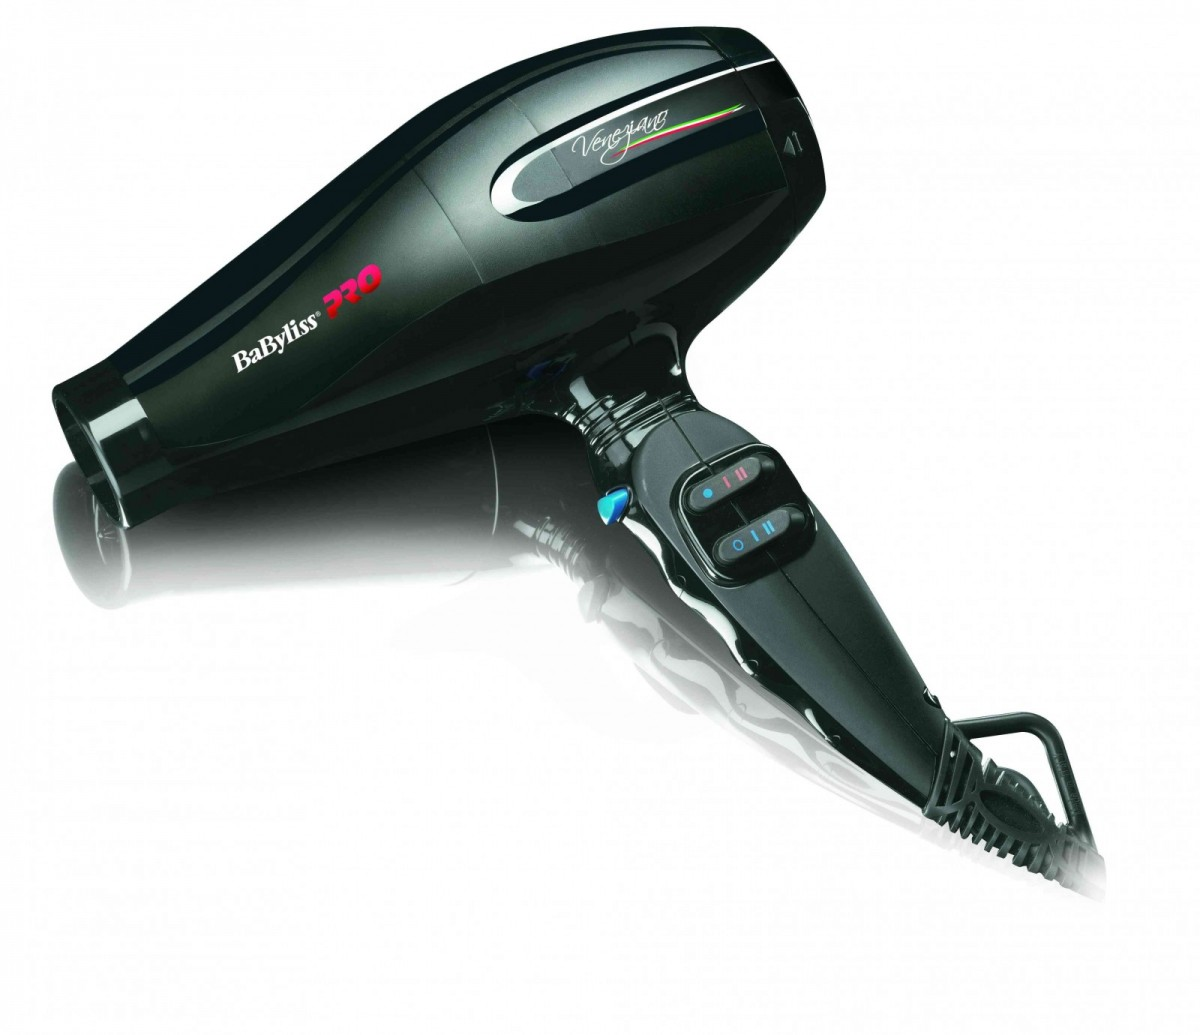 BAZÁR - BABYLISS PRO BAB6610INE Veneziano 2200 W profesionálny fén na vlasy 93790d71936